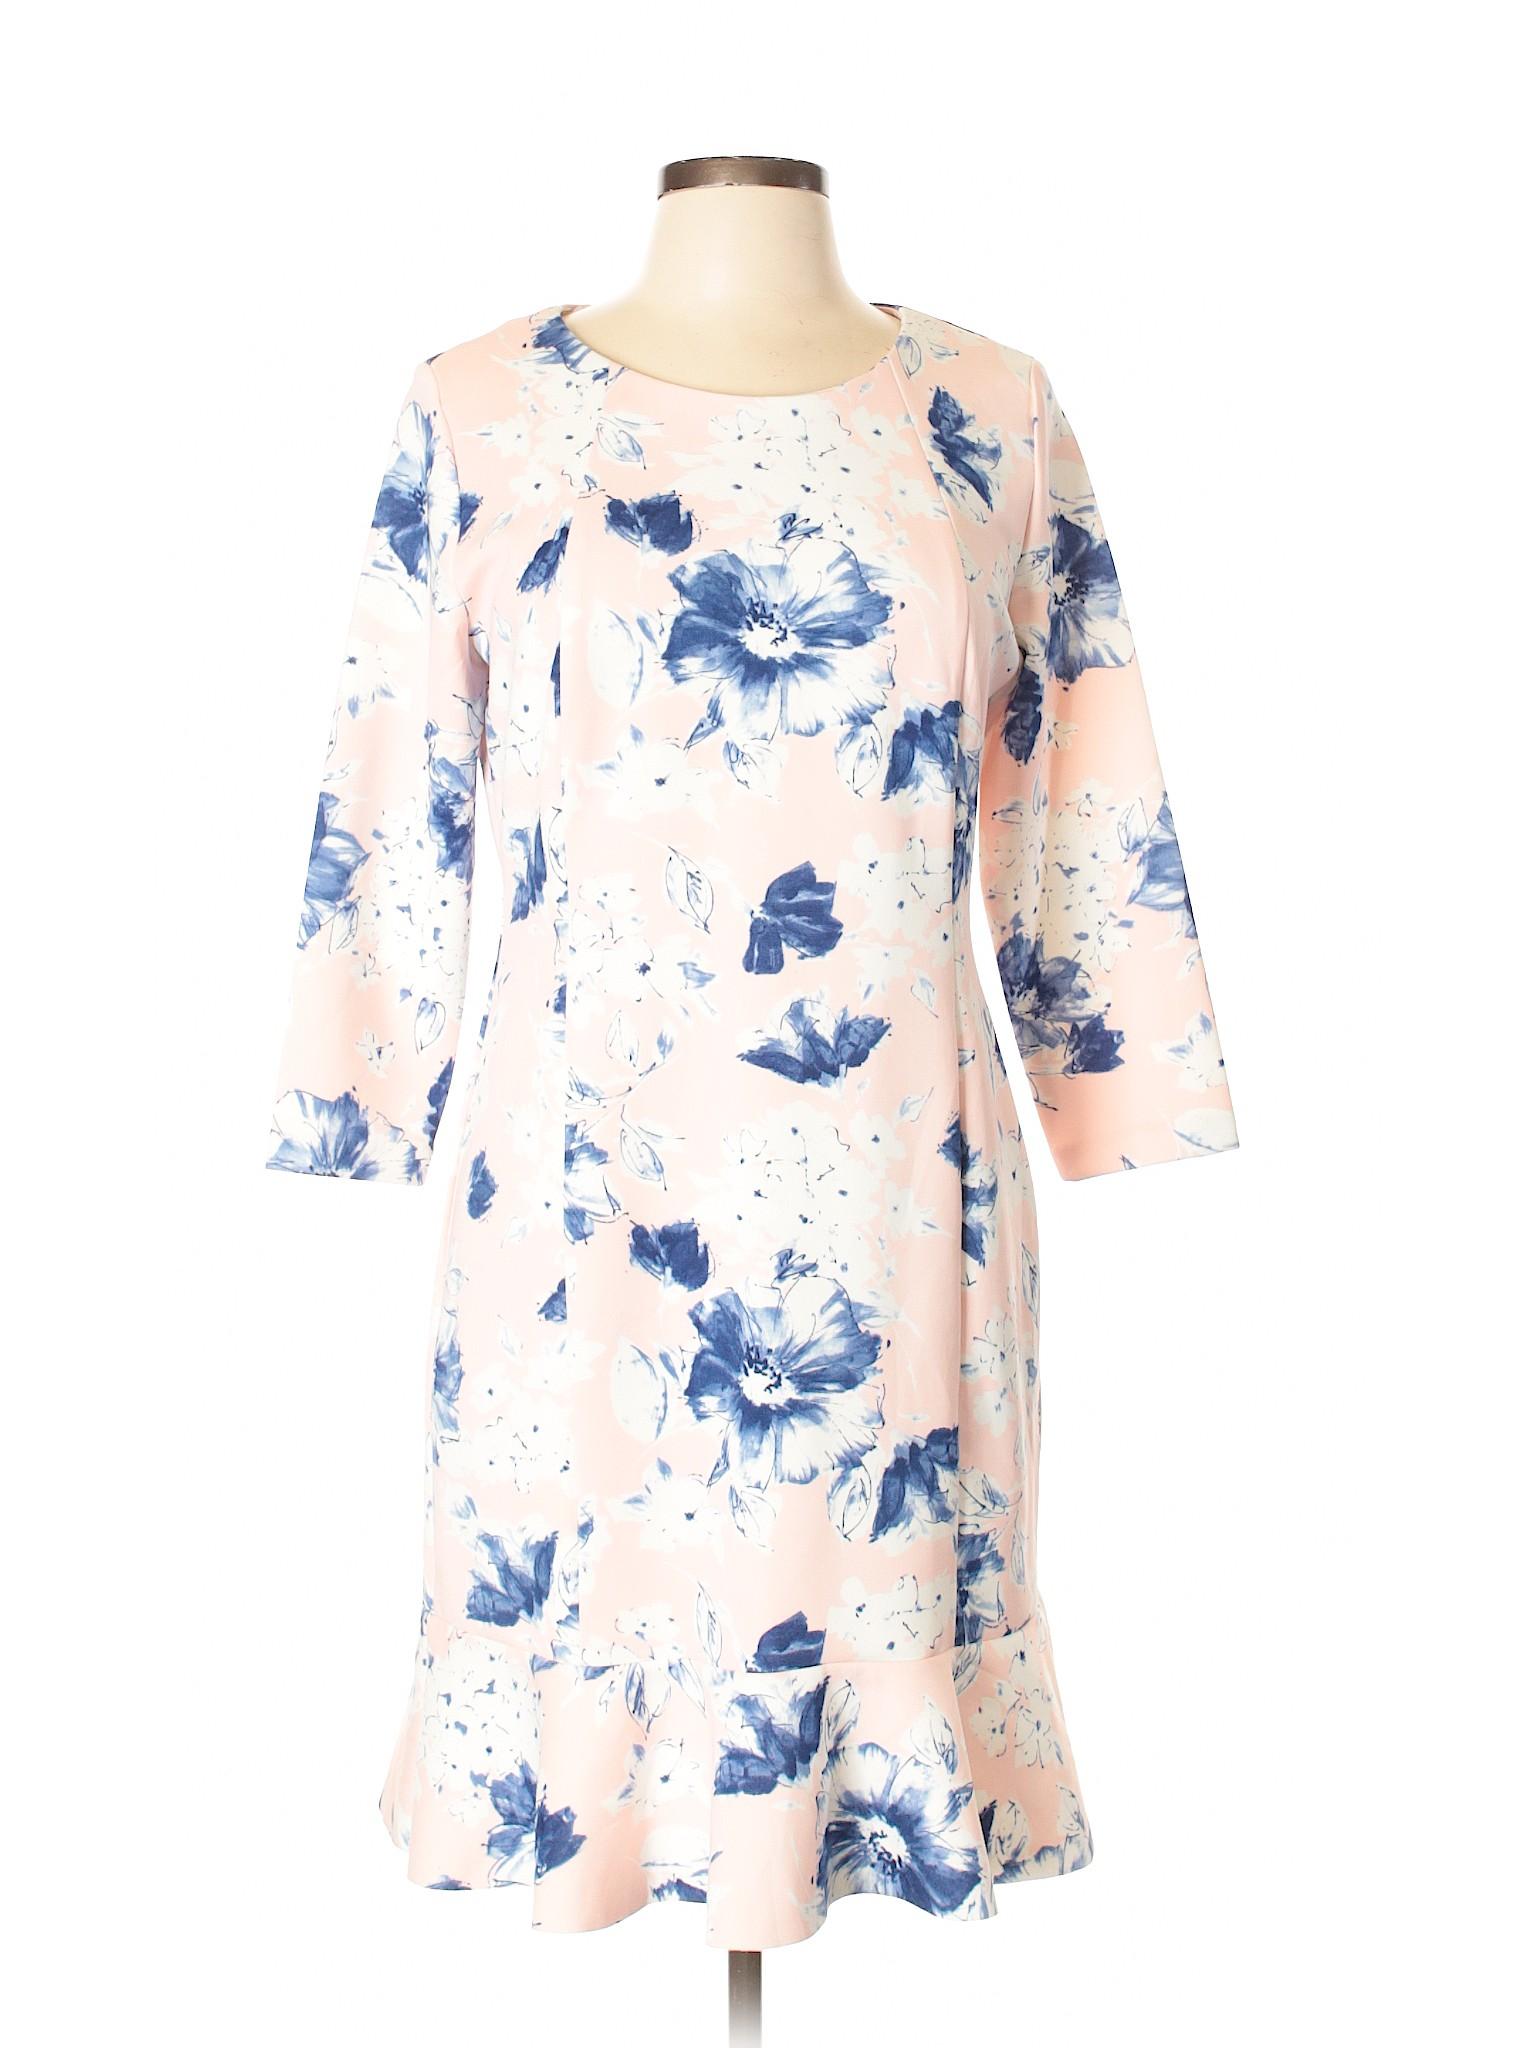 Casual winter Clothing Republic Boutique Dress Philosophy qA4SZxwR